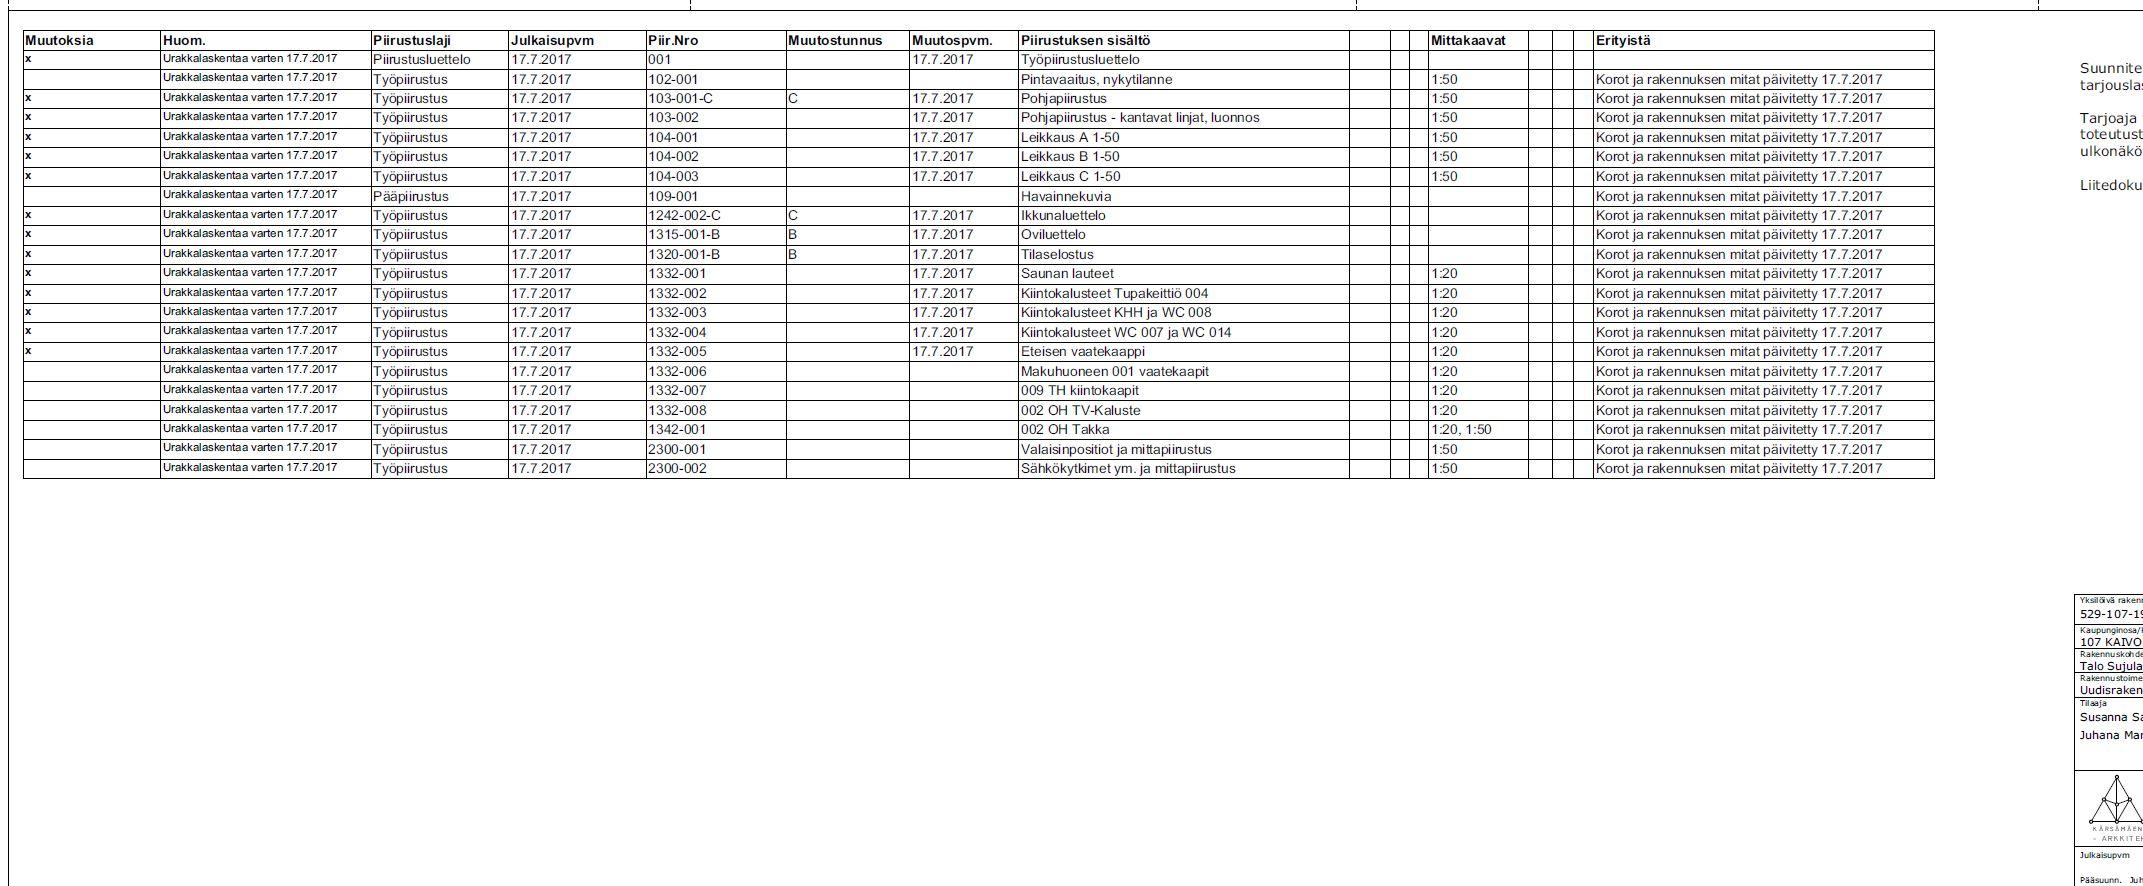 599c768d2da40_Worksheet-baseddrawingschedule.JPG.5fc721b7a66c245041a30bc296525e40.JPG